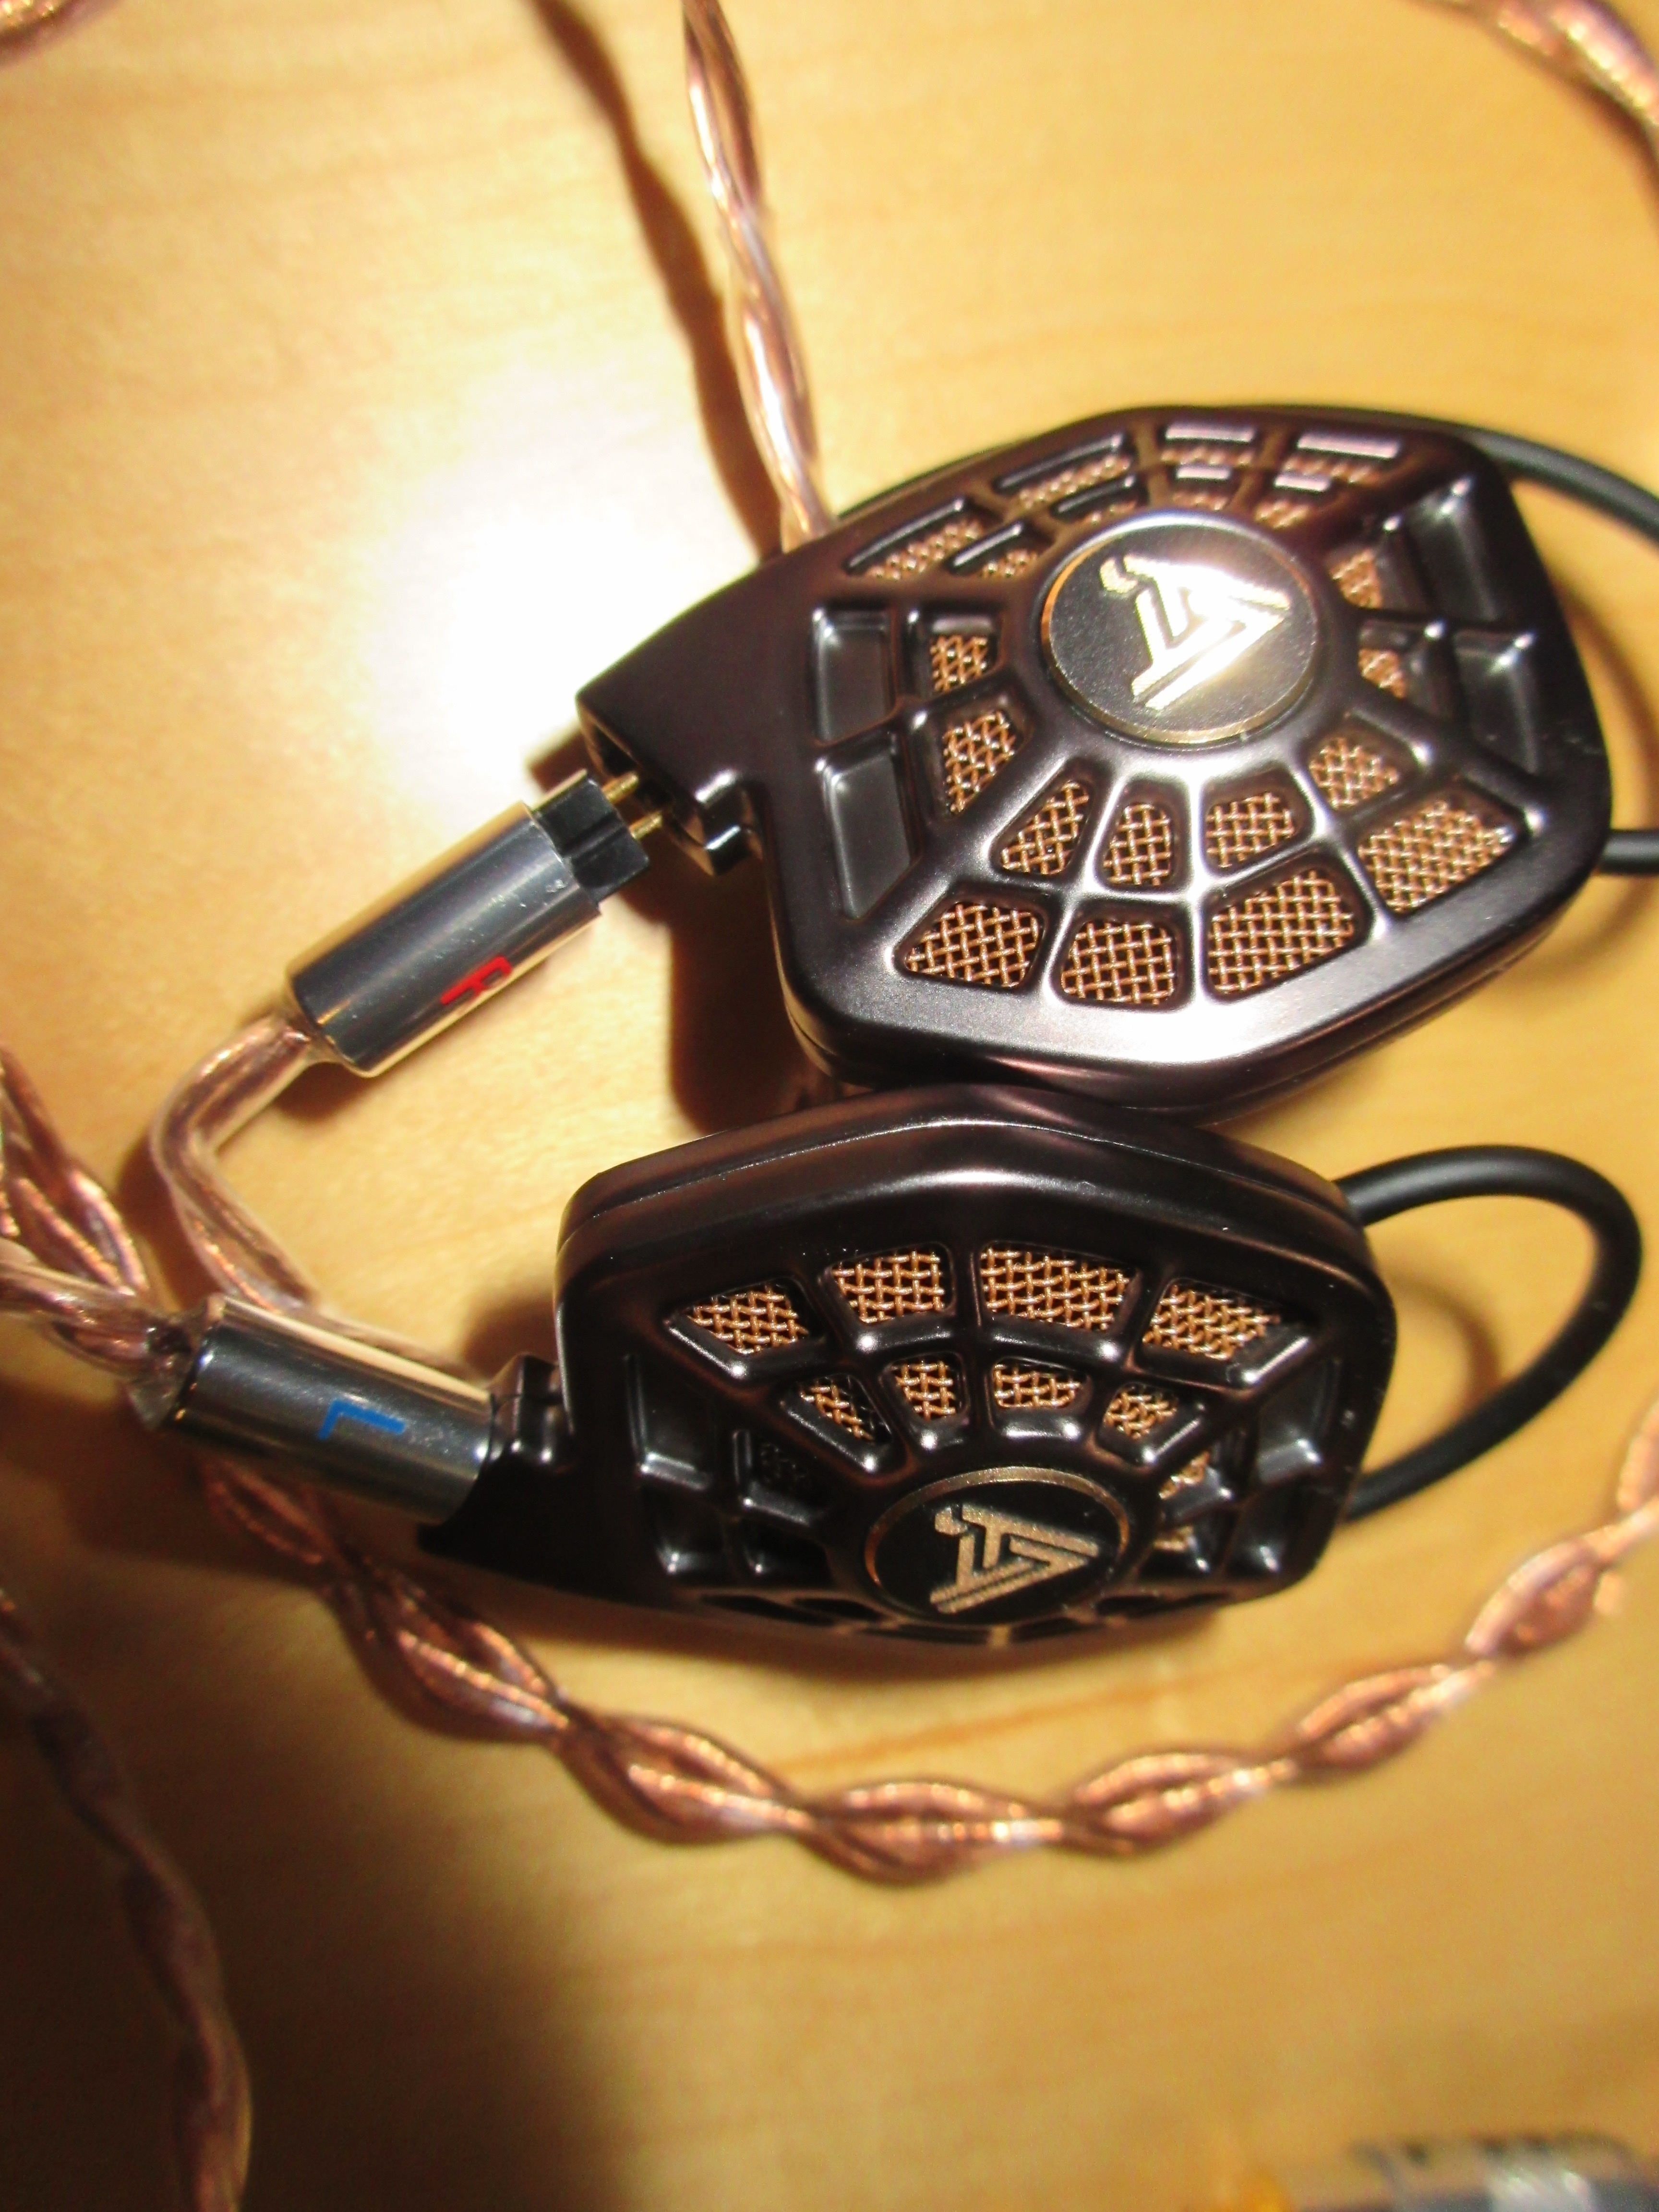 Audeze Isine20 And Pw Audio Anniversary Series No 5 Copper